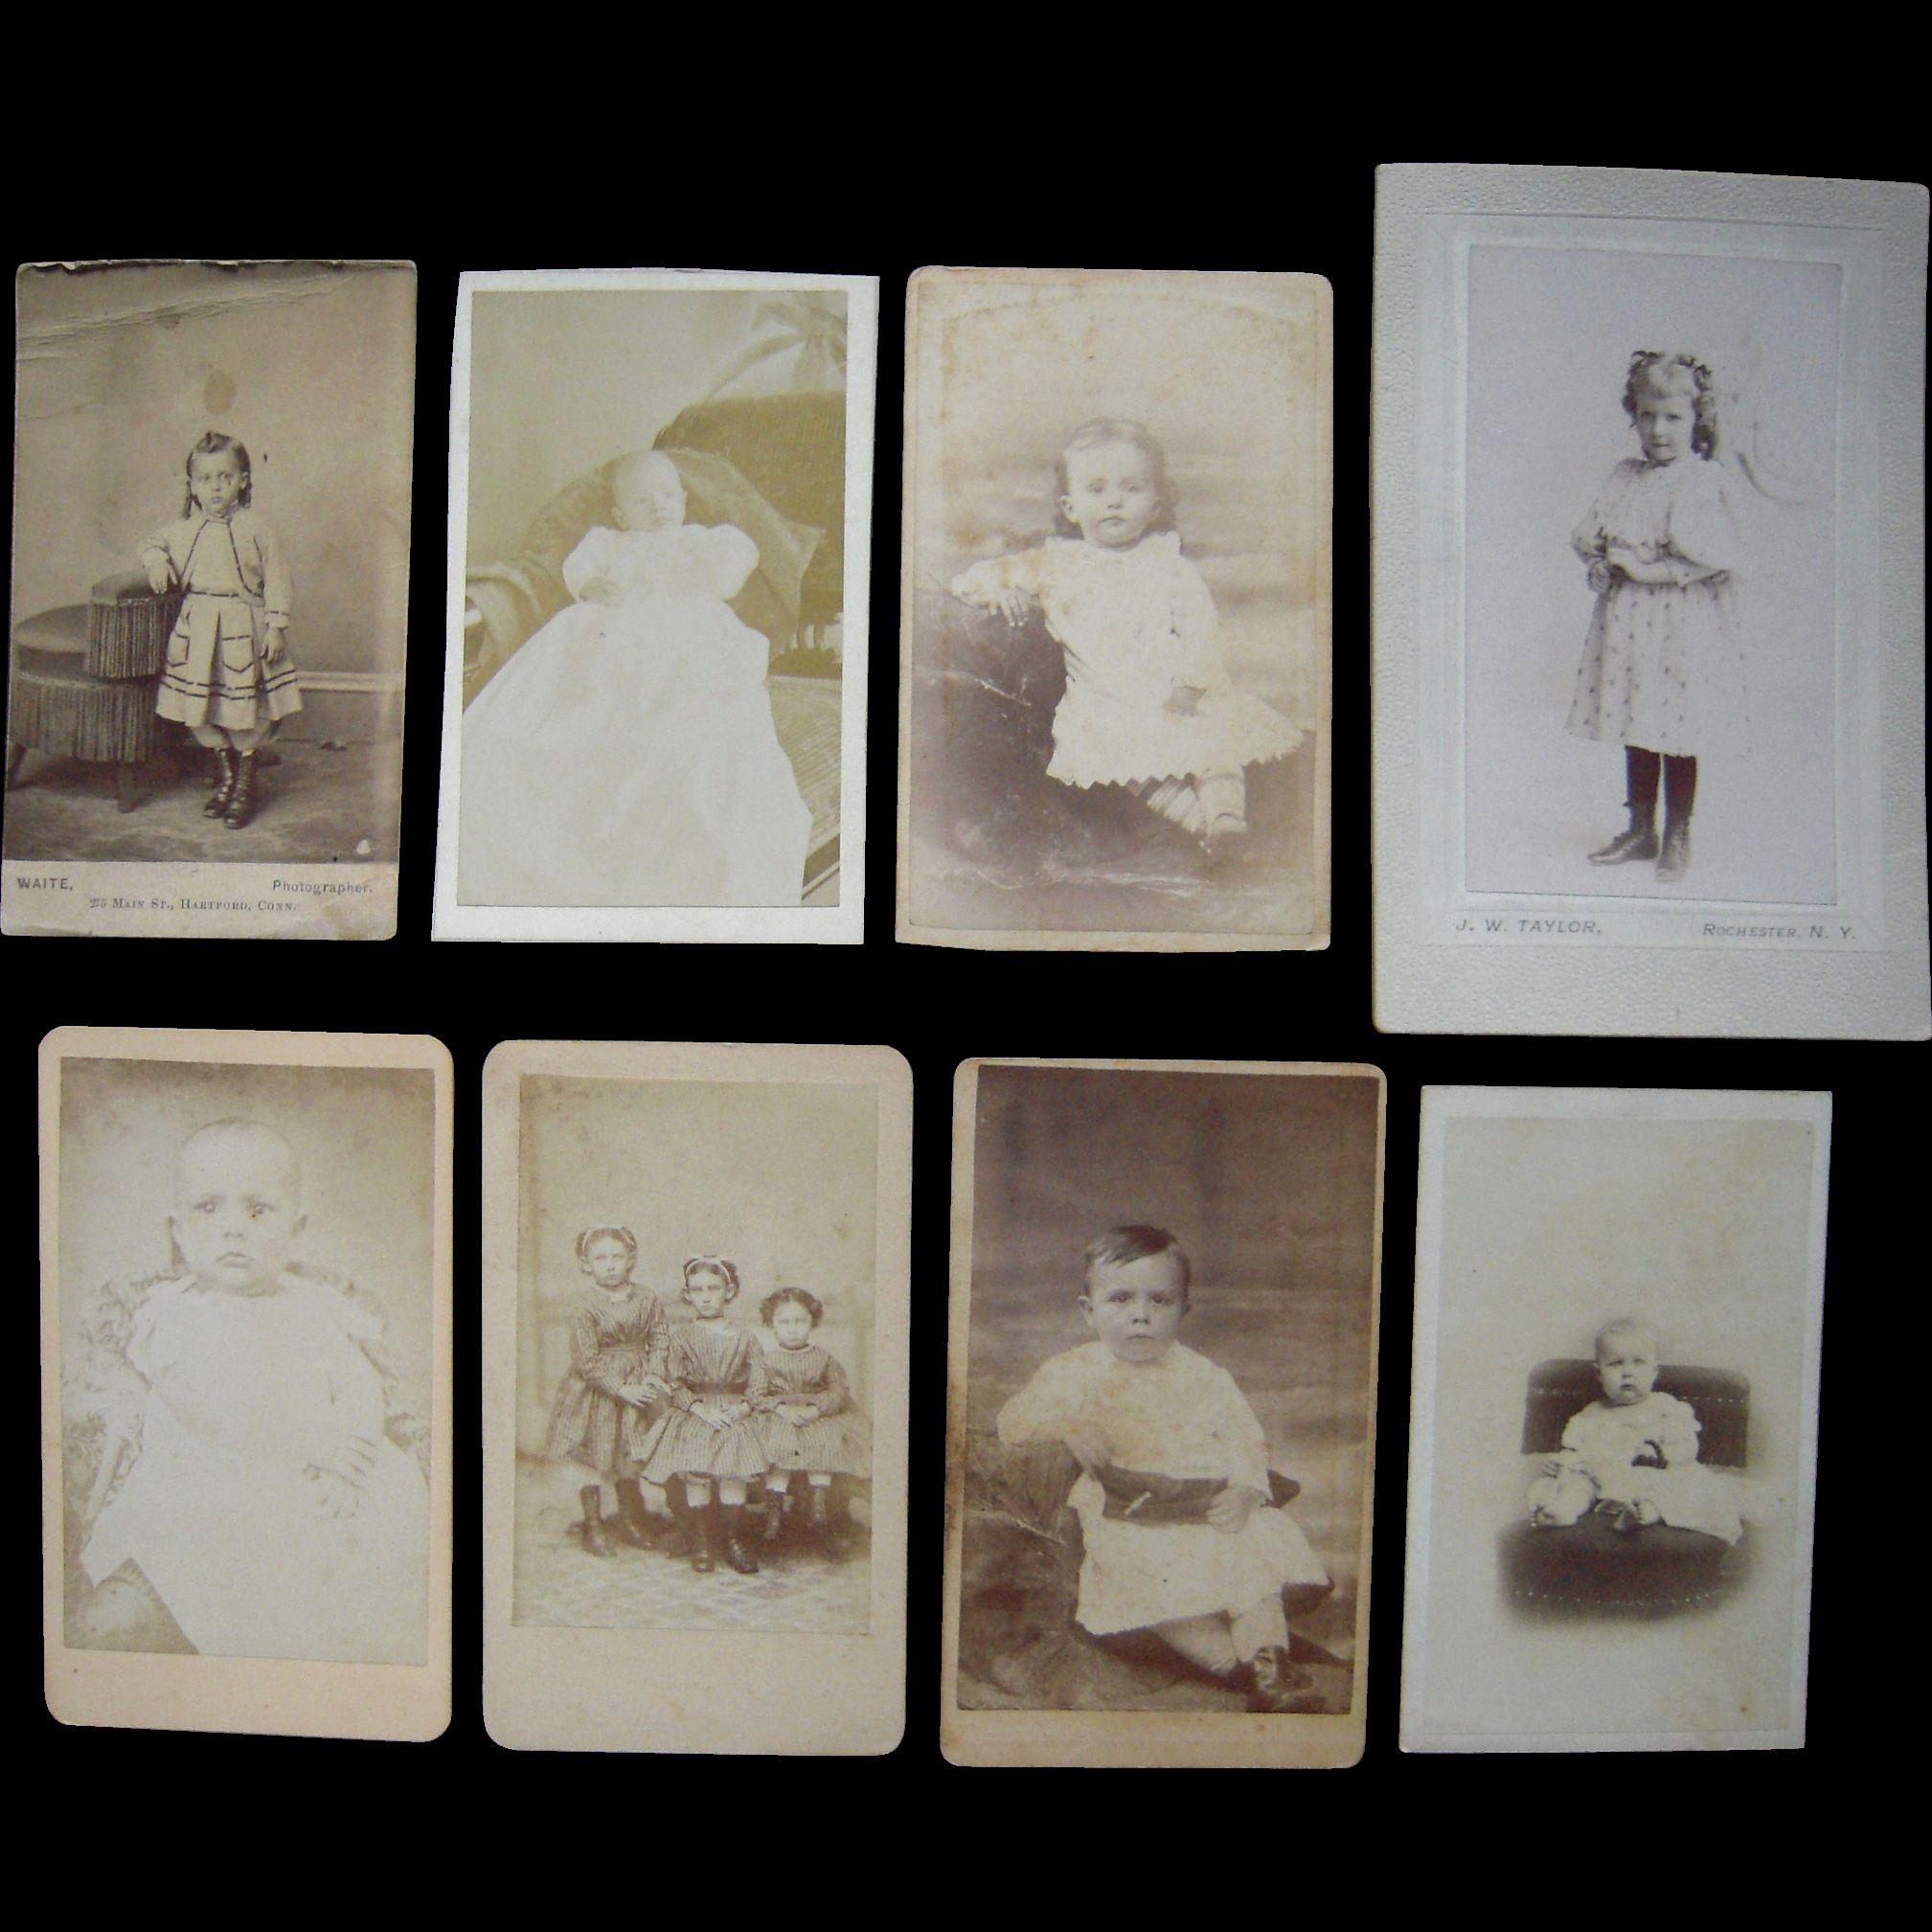 Lot Of 8 1860s Cdv Photos Of Children Plus I Small Cdv